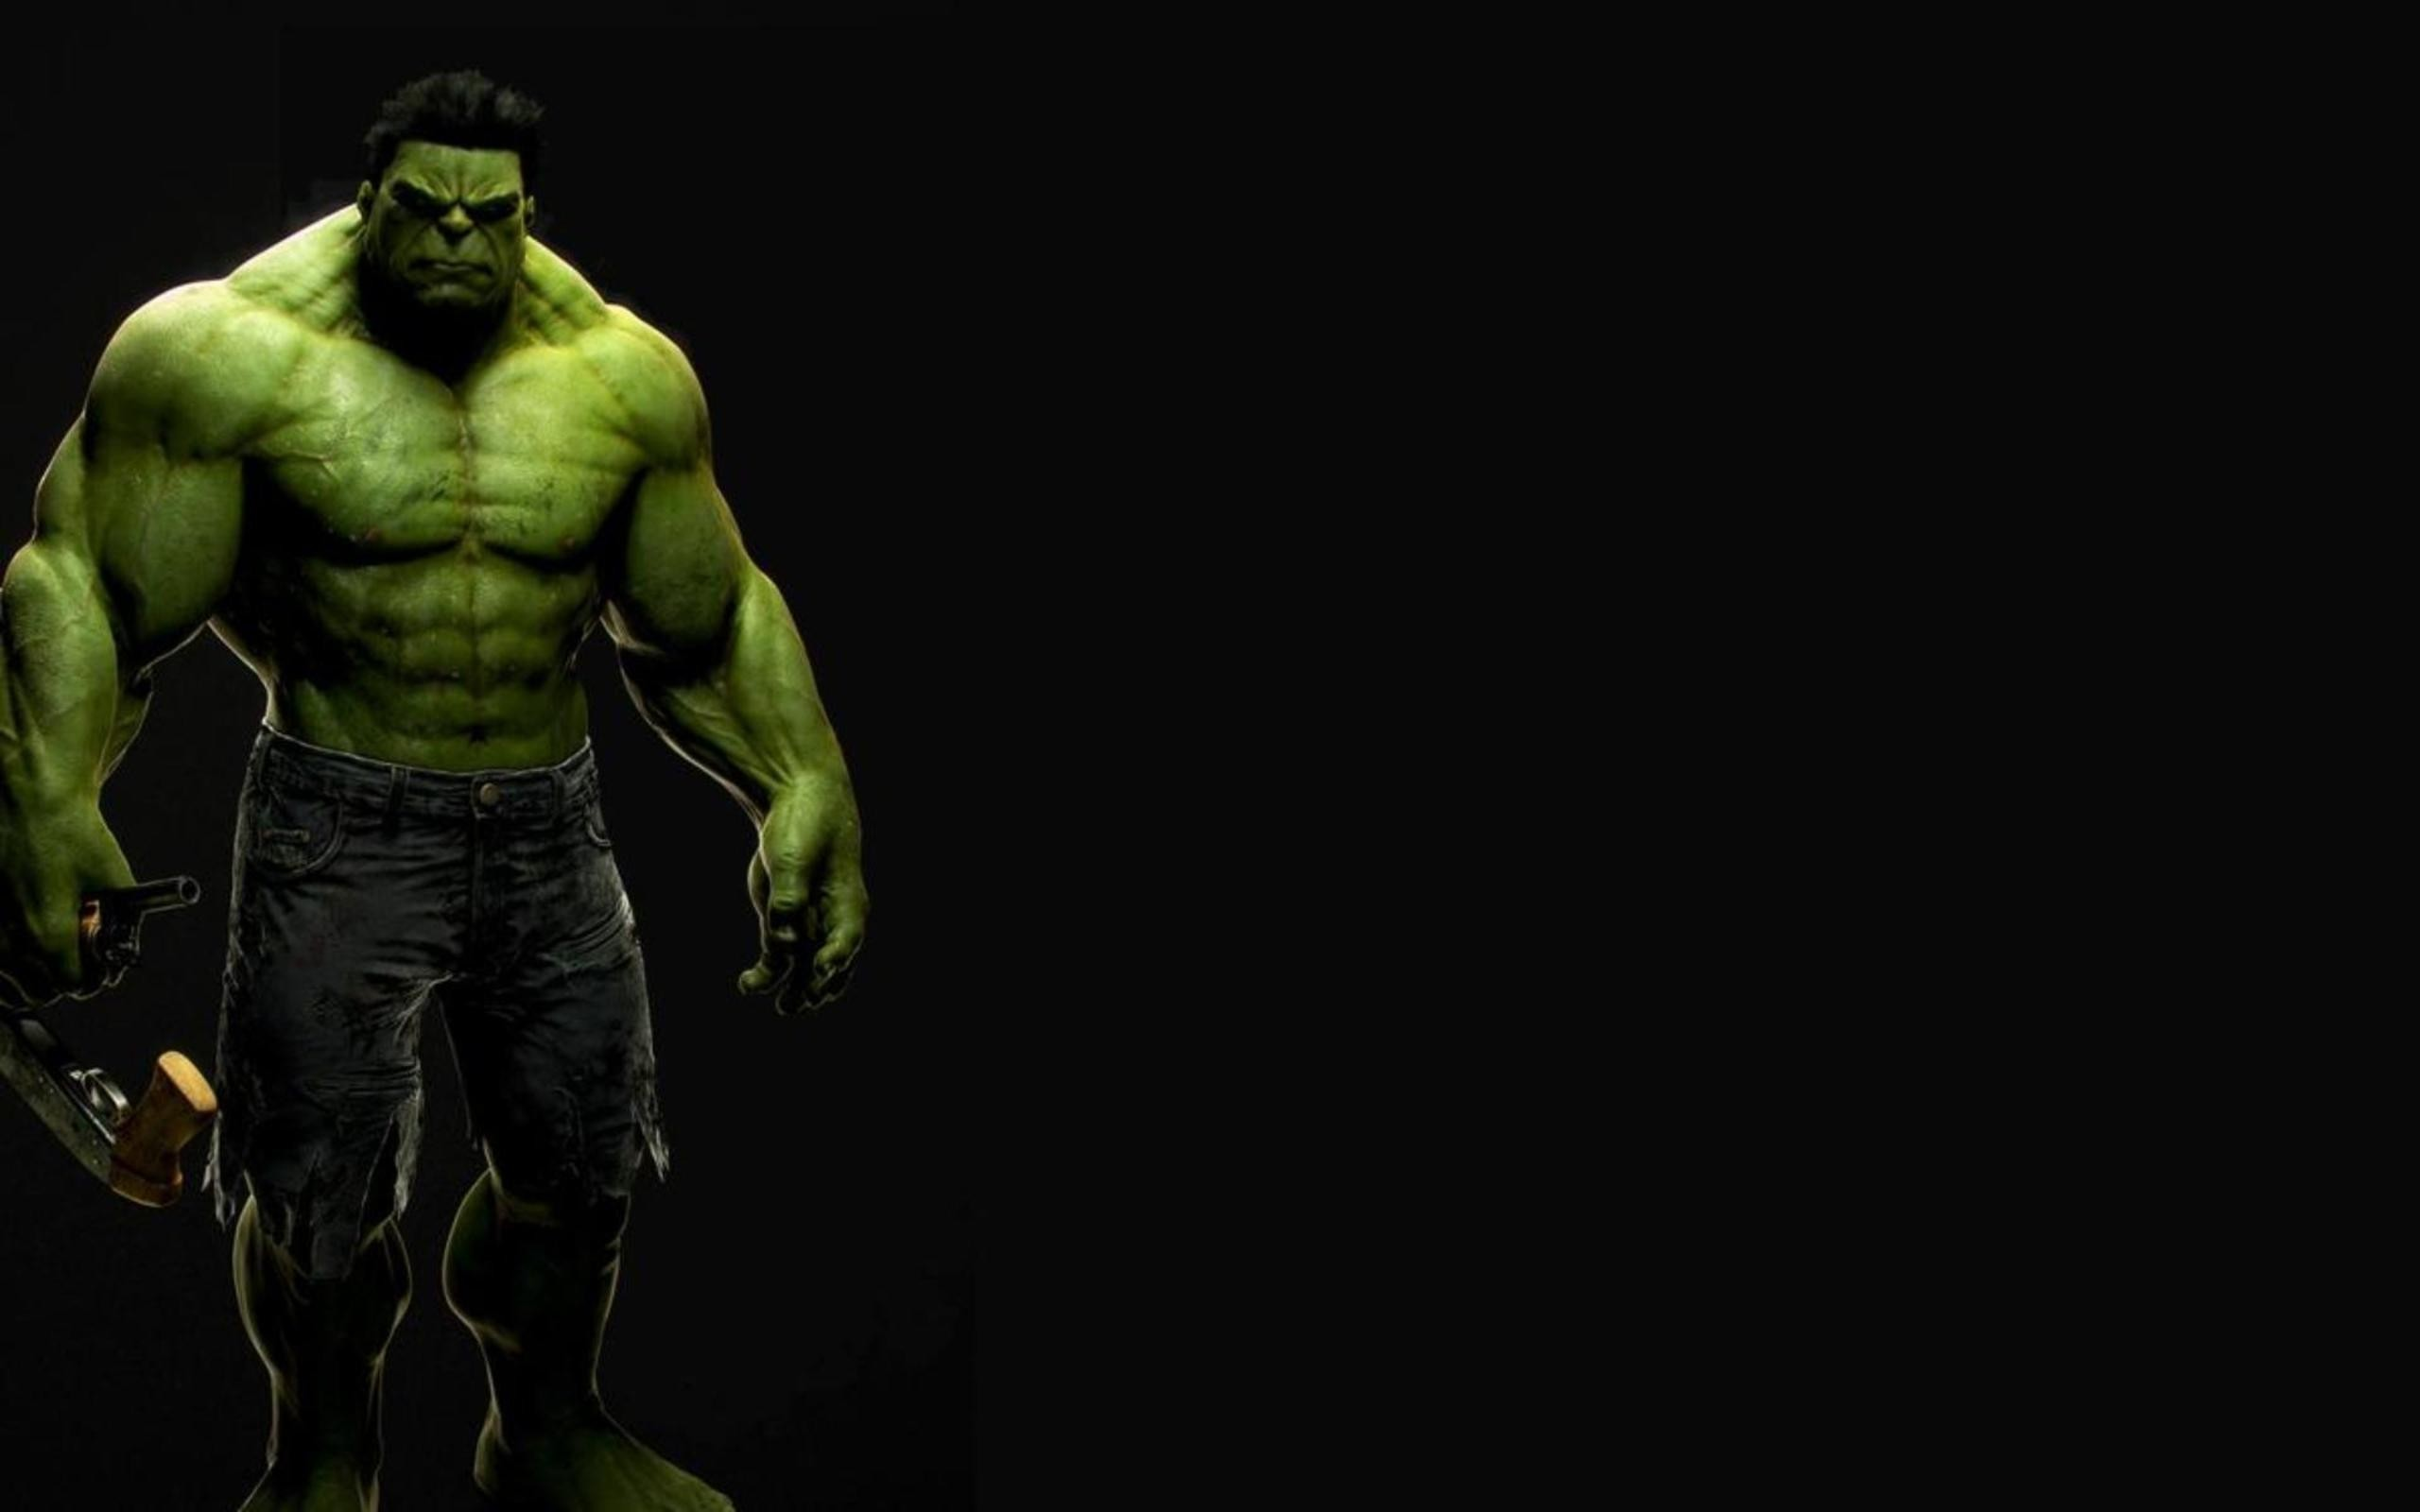 Res: 2560x1600, Avengers Hulk Wallpaper 15 - 2560 X 1600